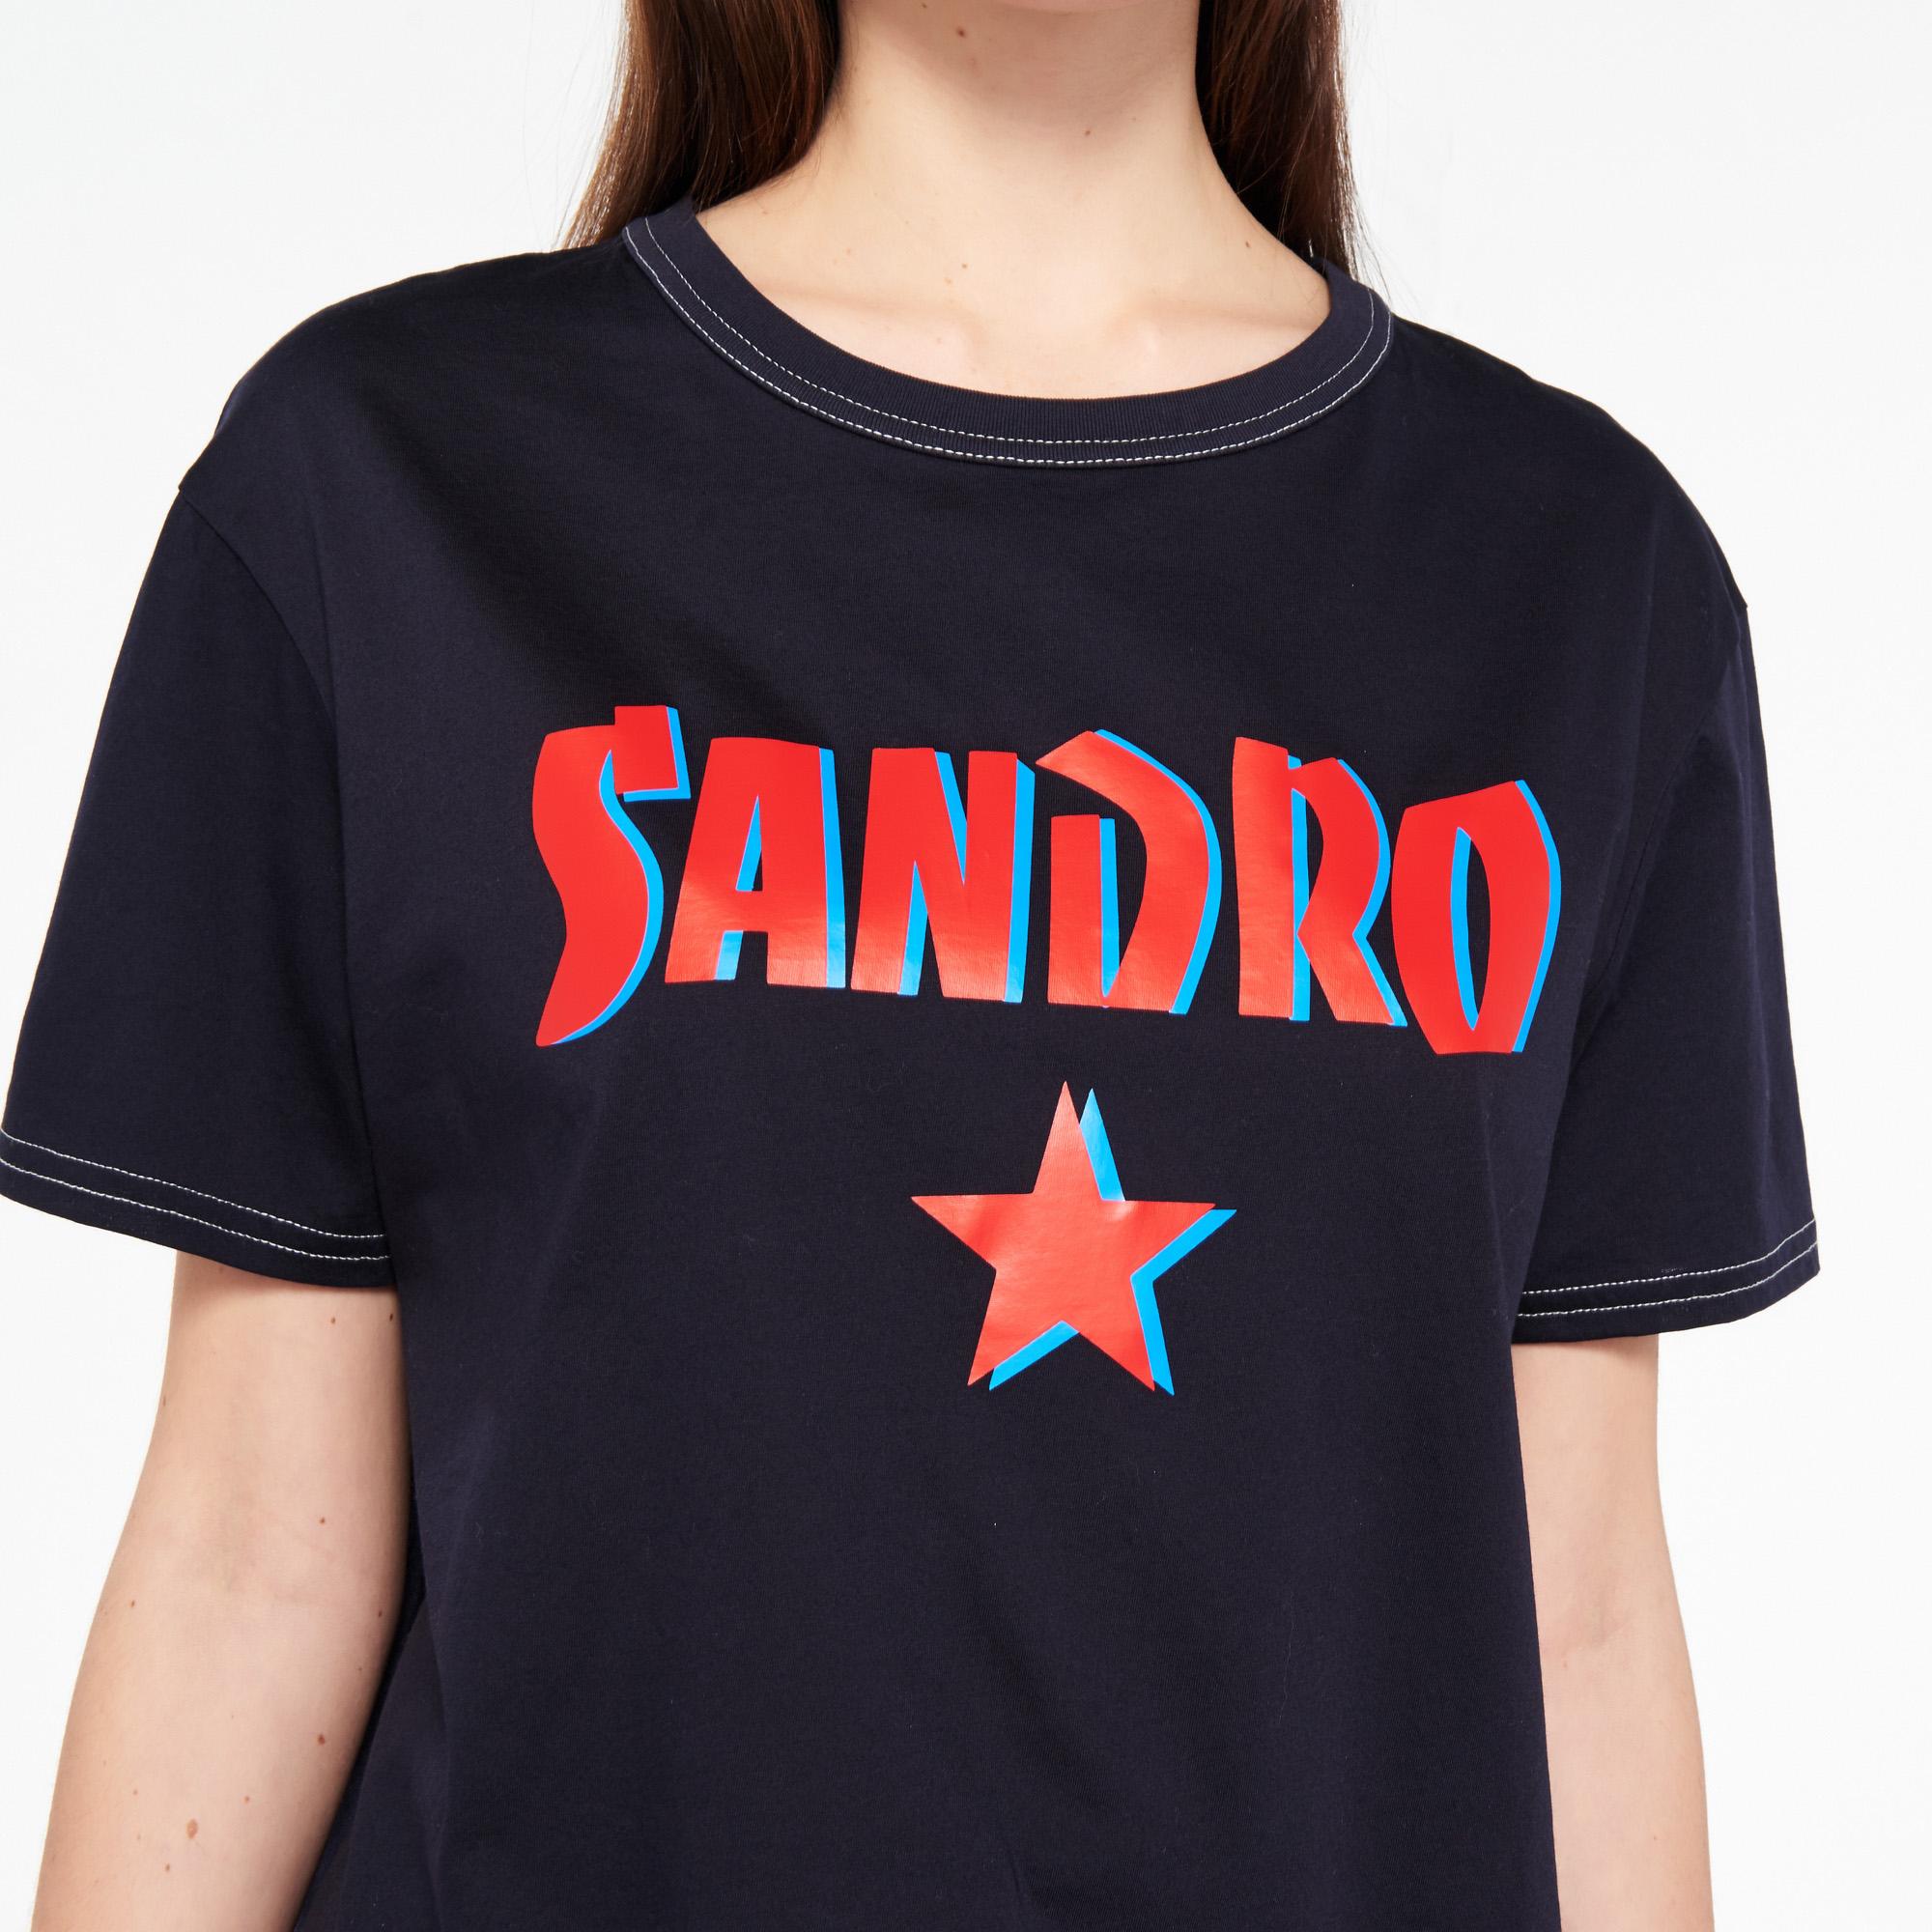 Sandro_T10561E-44_V_4